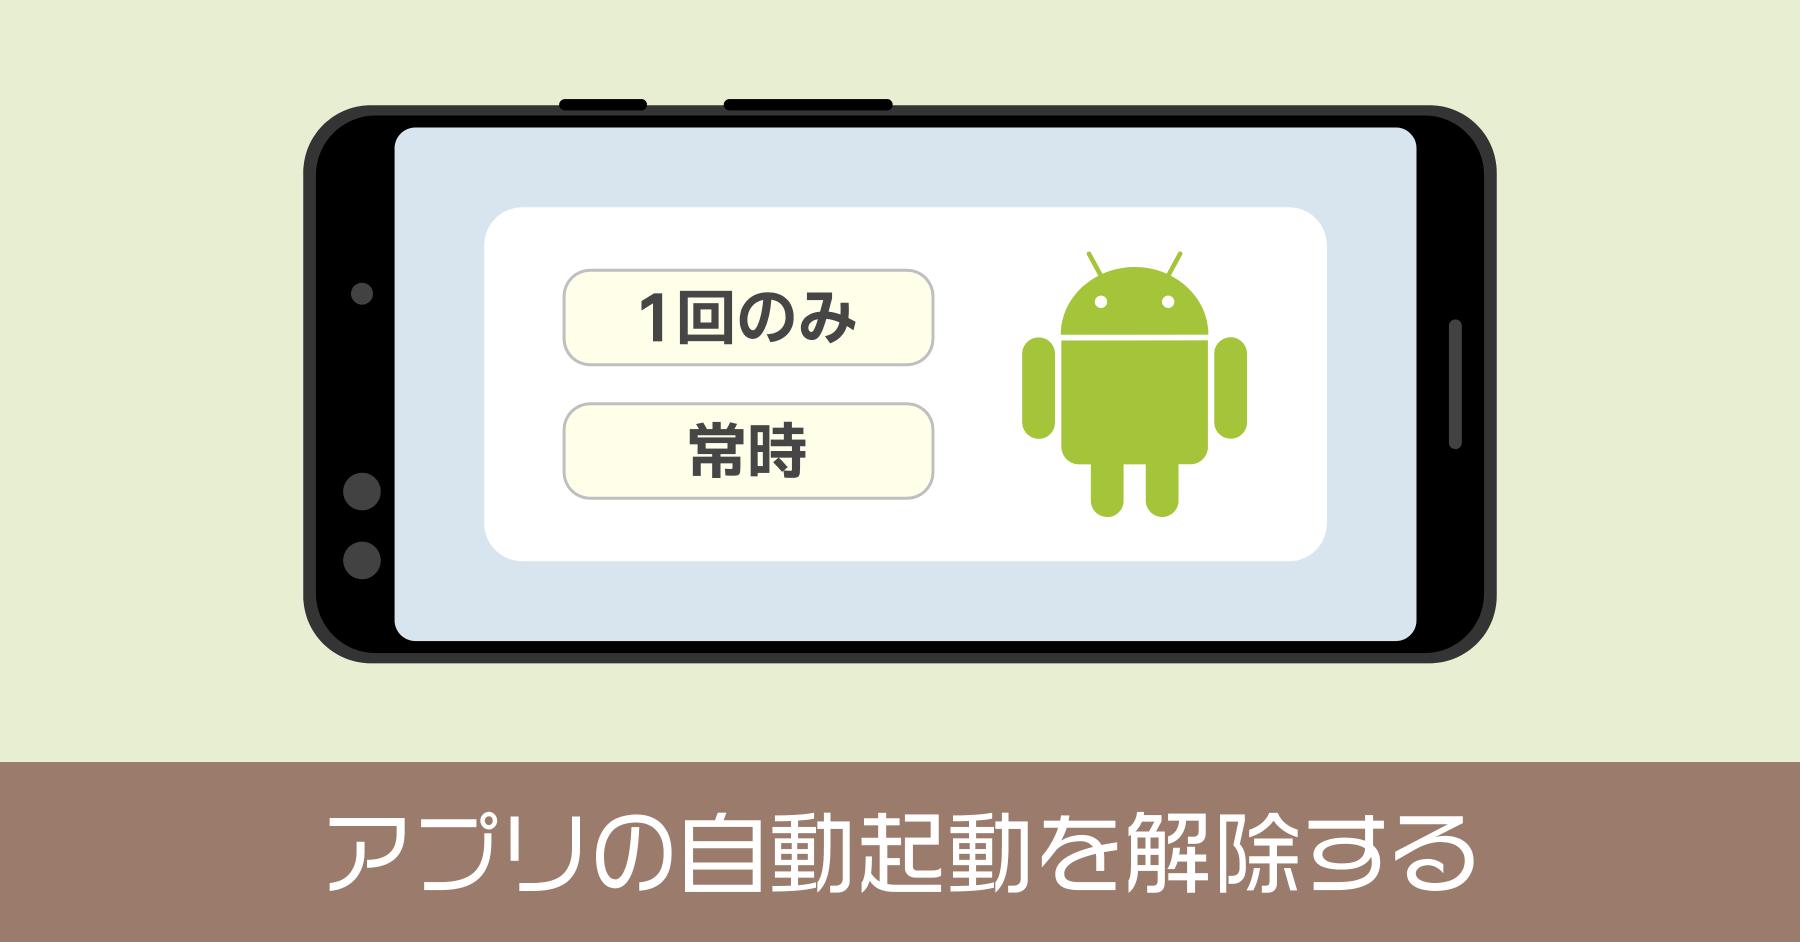 Android アプリを「常に開く」に設定した場合の解除方法